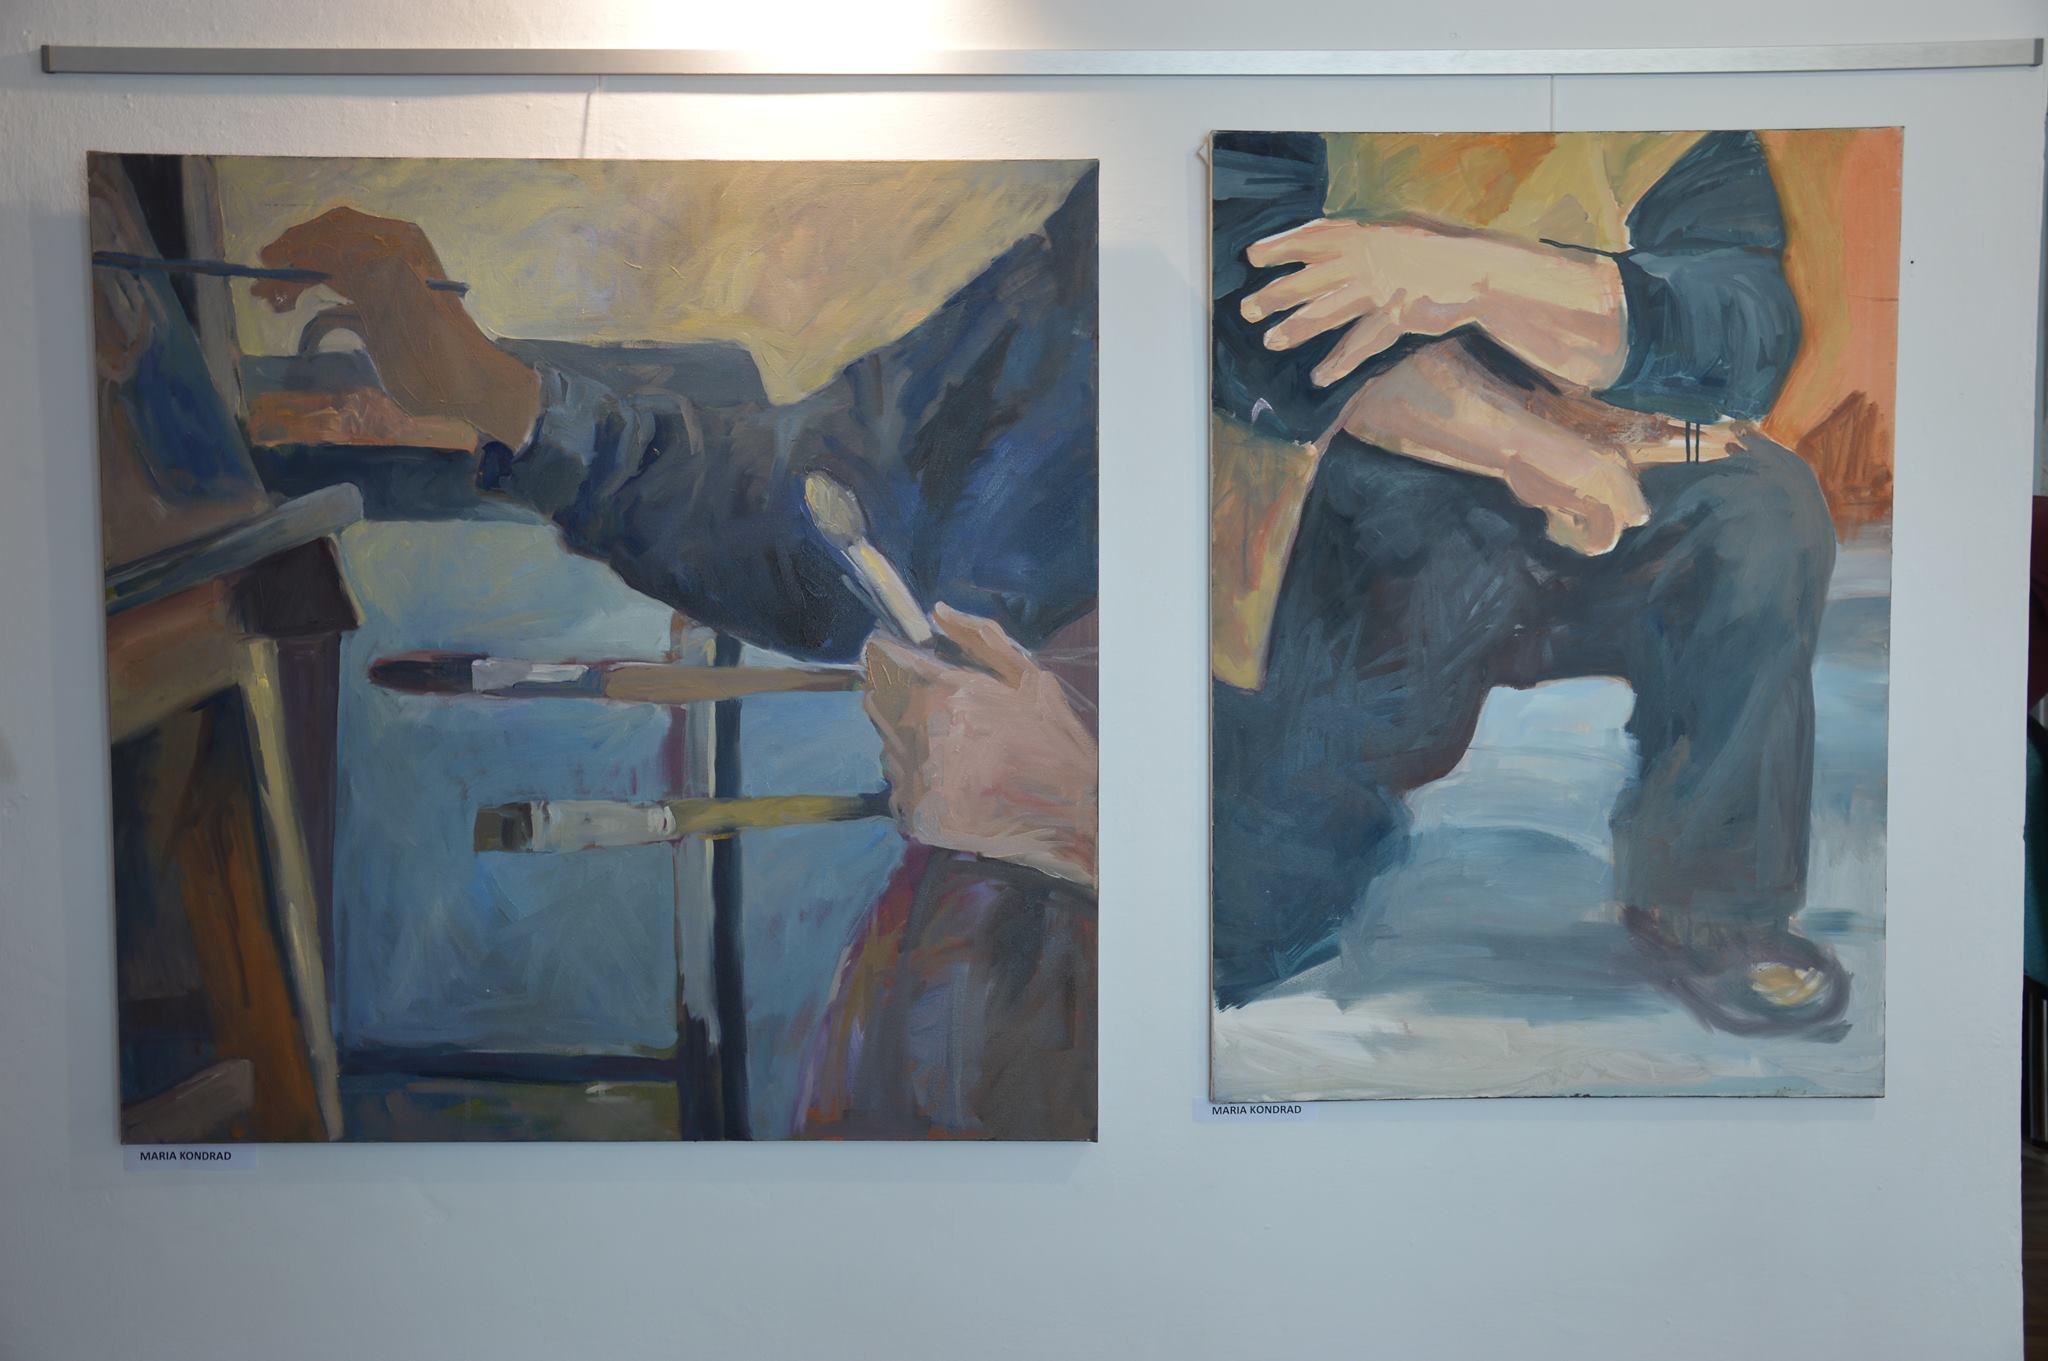 galeria mdk (1)